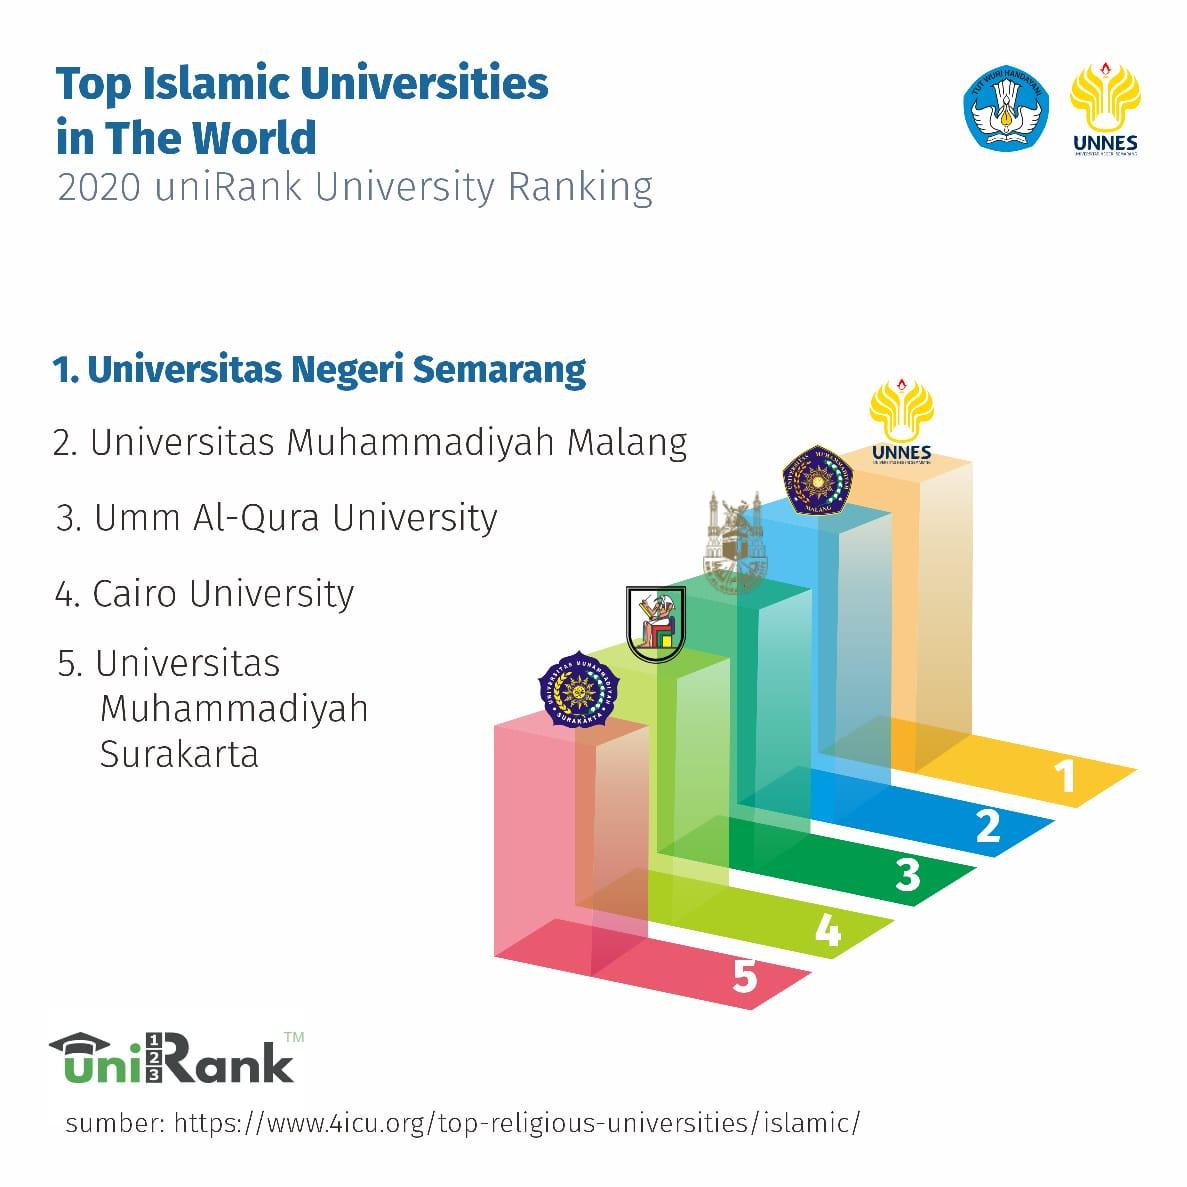 UNNES Peringkat 1 Dunia Sebagai Islamic Universities Versi 4ICU